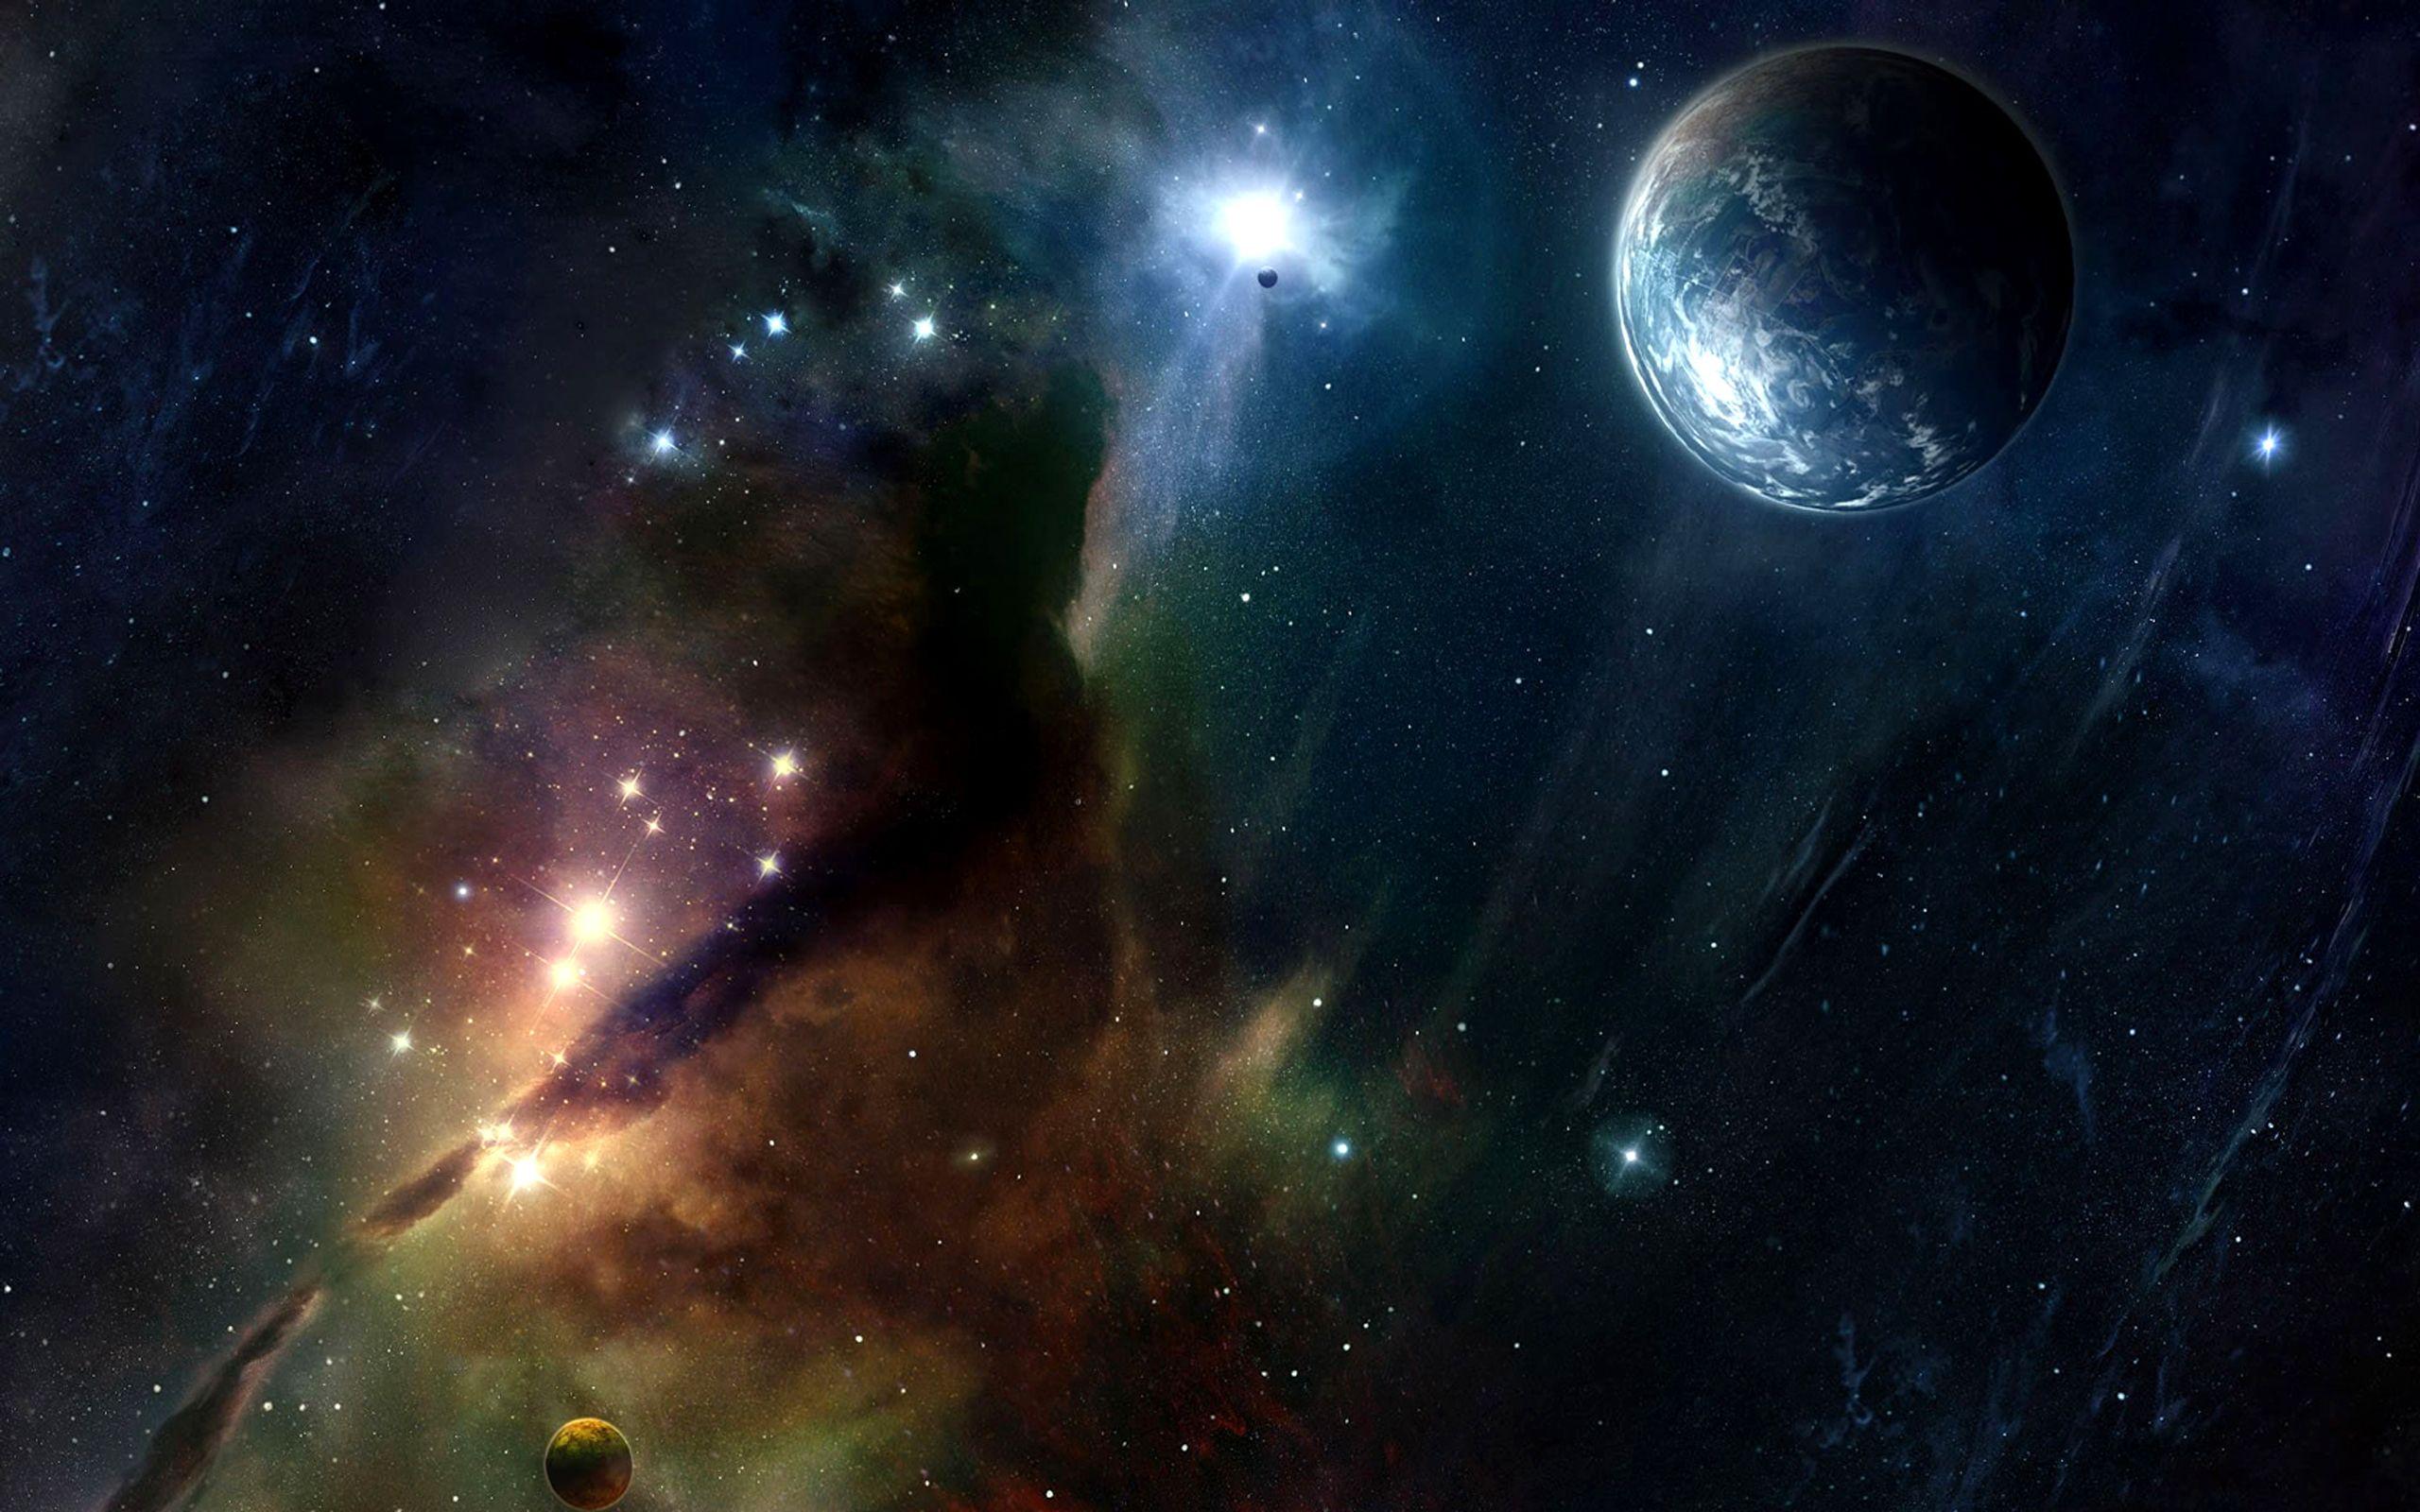 Cool Wallpaper High Resolution Universe - 07bf00c58ff709da7922a9a3909913e6  Collection_97913.jpg